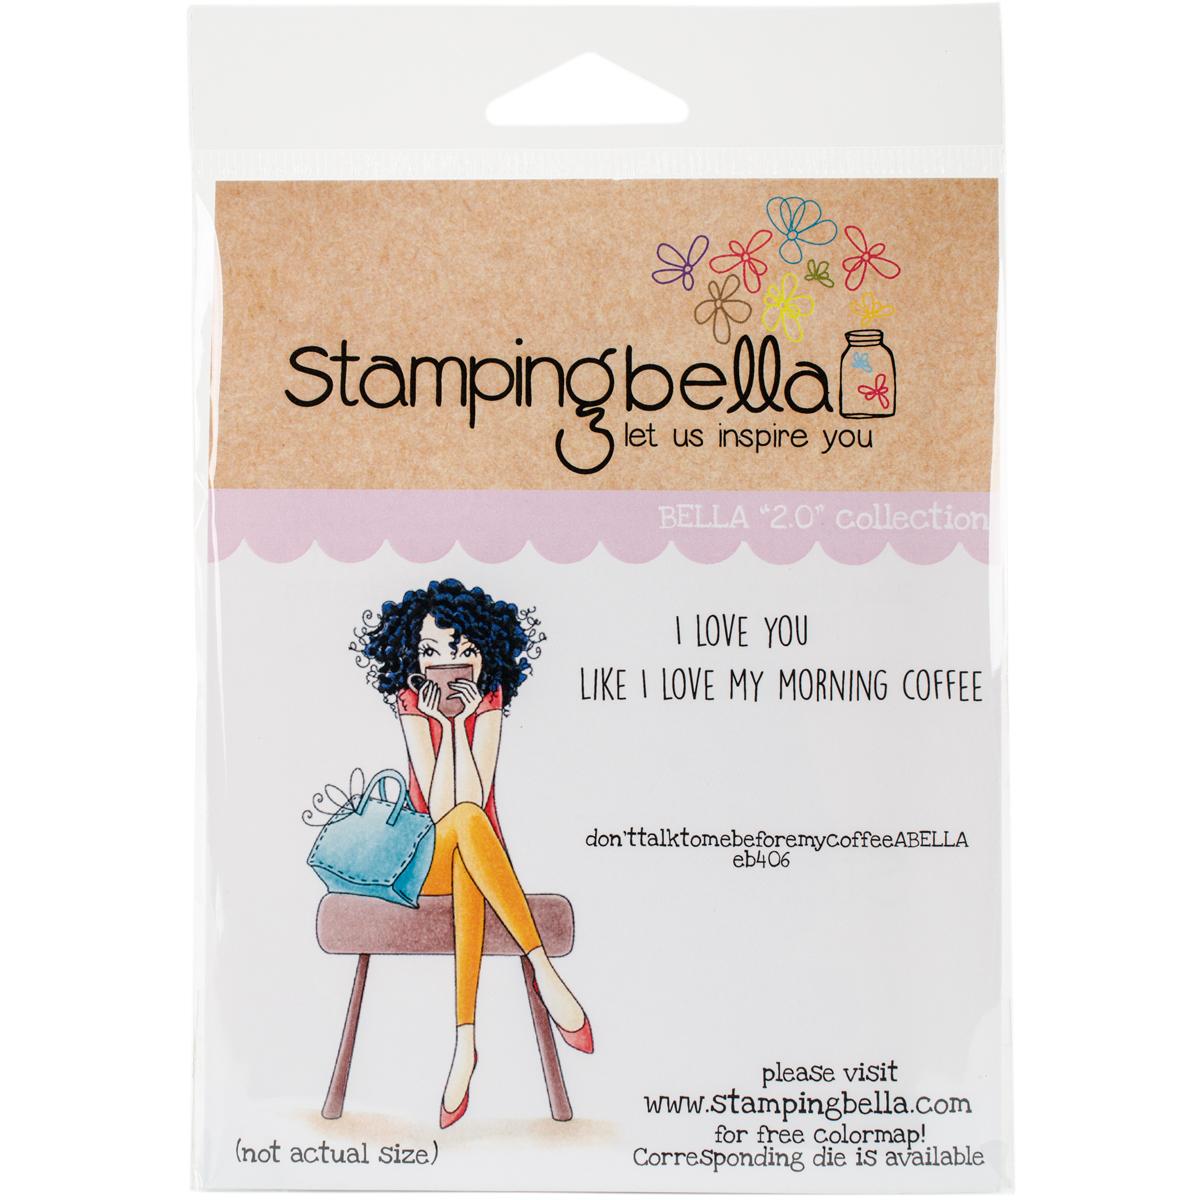 ^Stamping Bella Rubber Stamp Set don'ttalktomebeforemycoffeeabella (eb406)